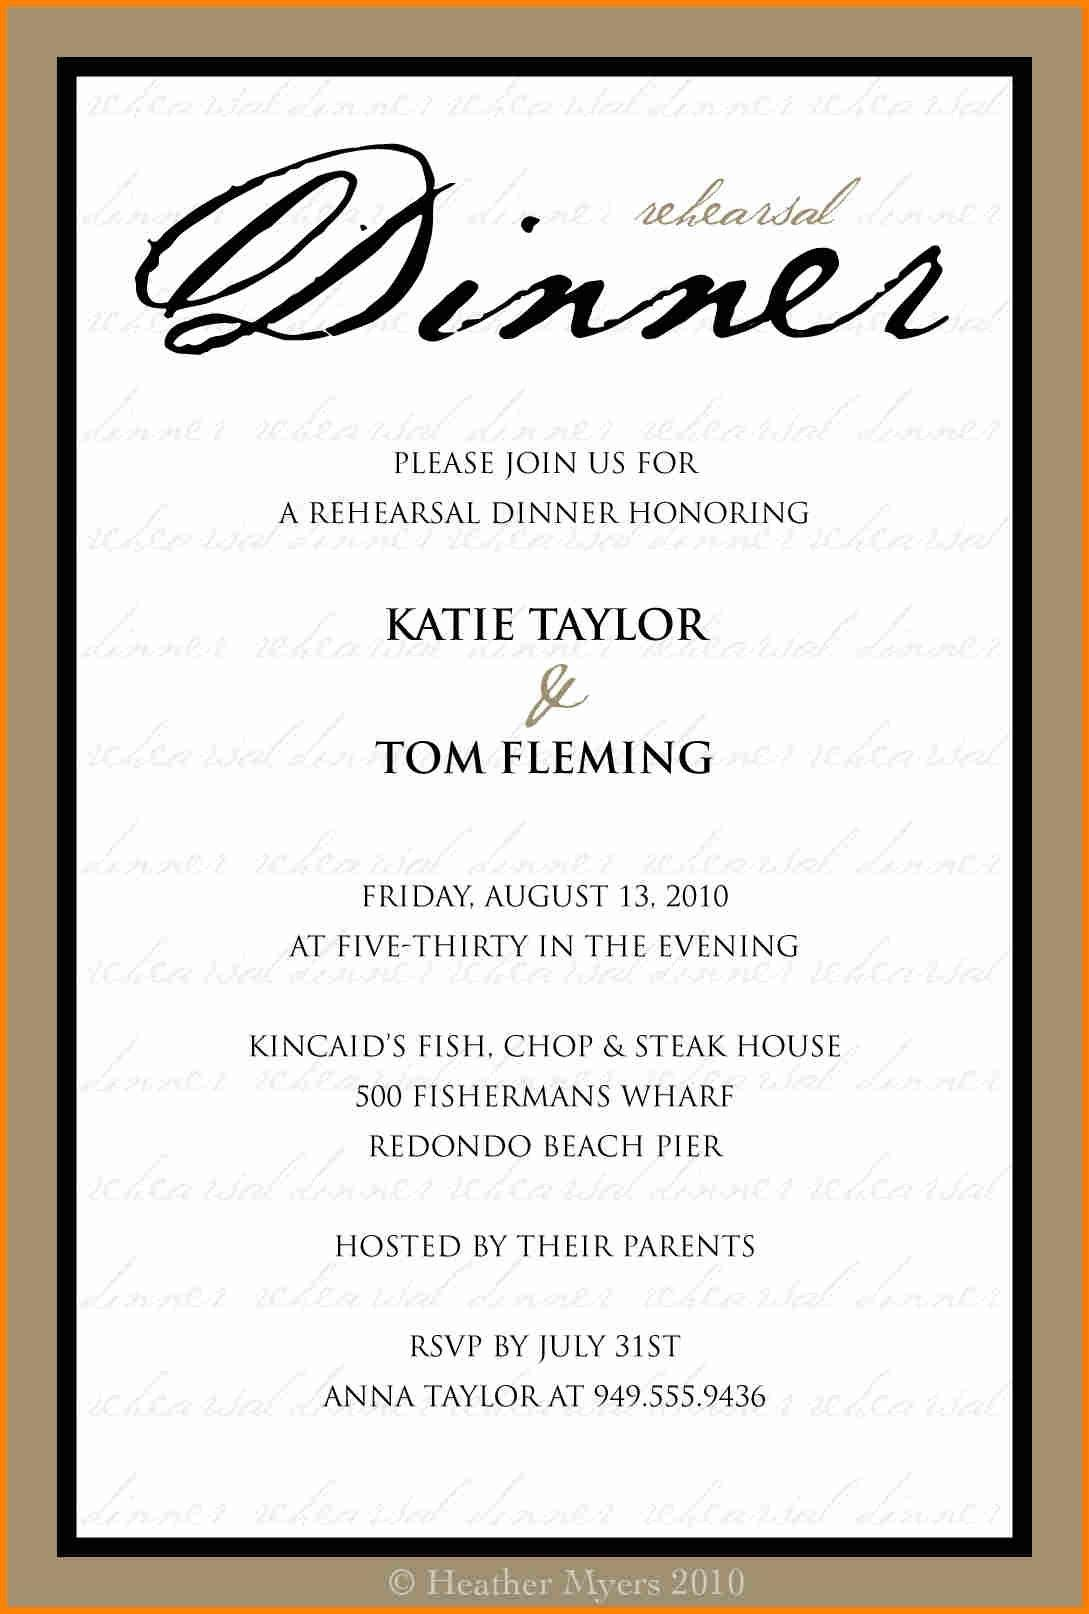 Corporate Dinner Invitation Wording Ideas